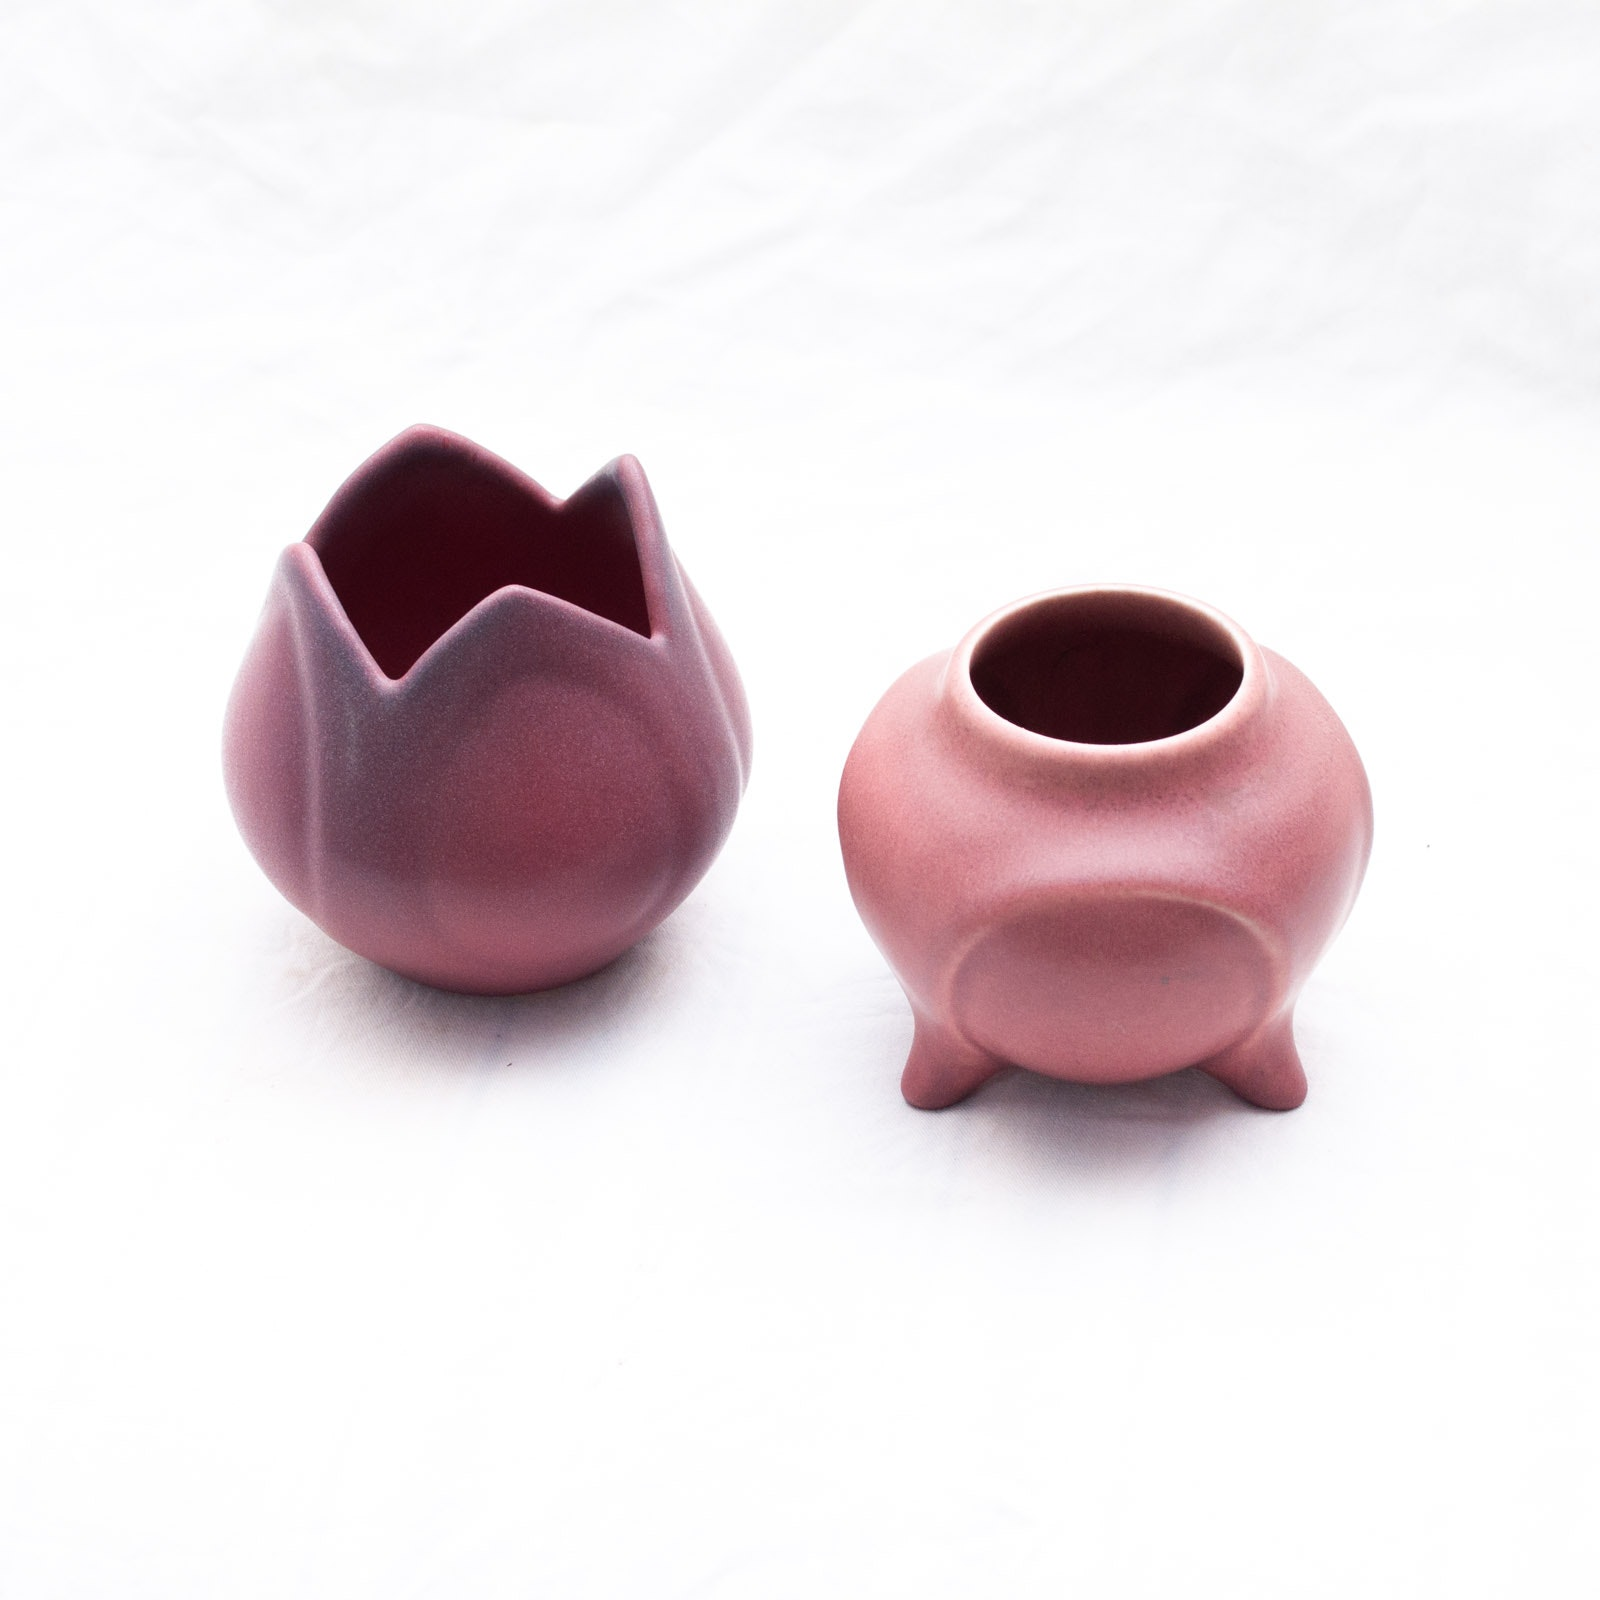 1920s Rookwood and Van Briggle Pottery Ceramic Vases